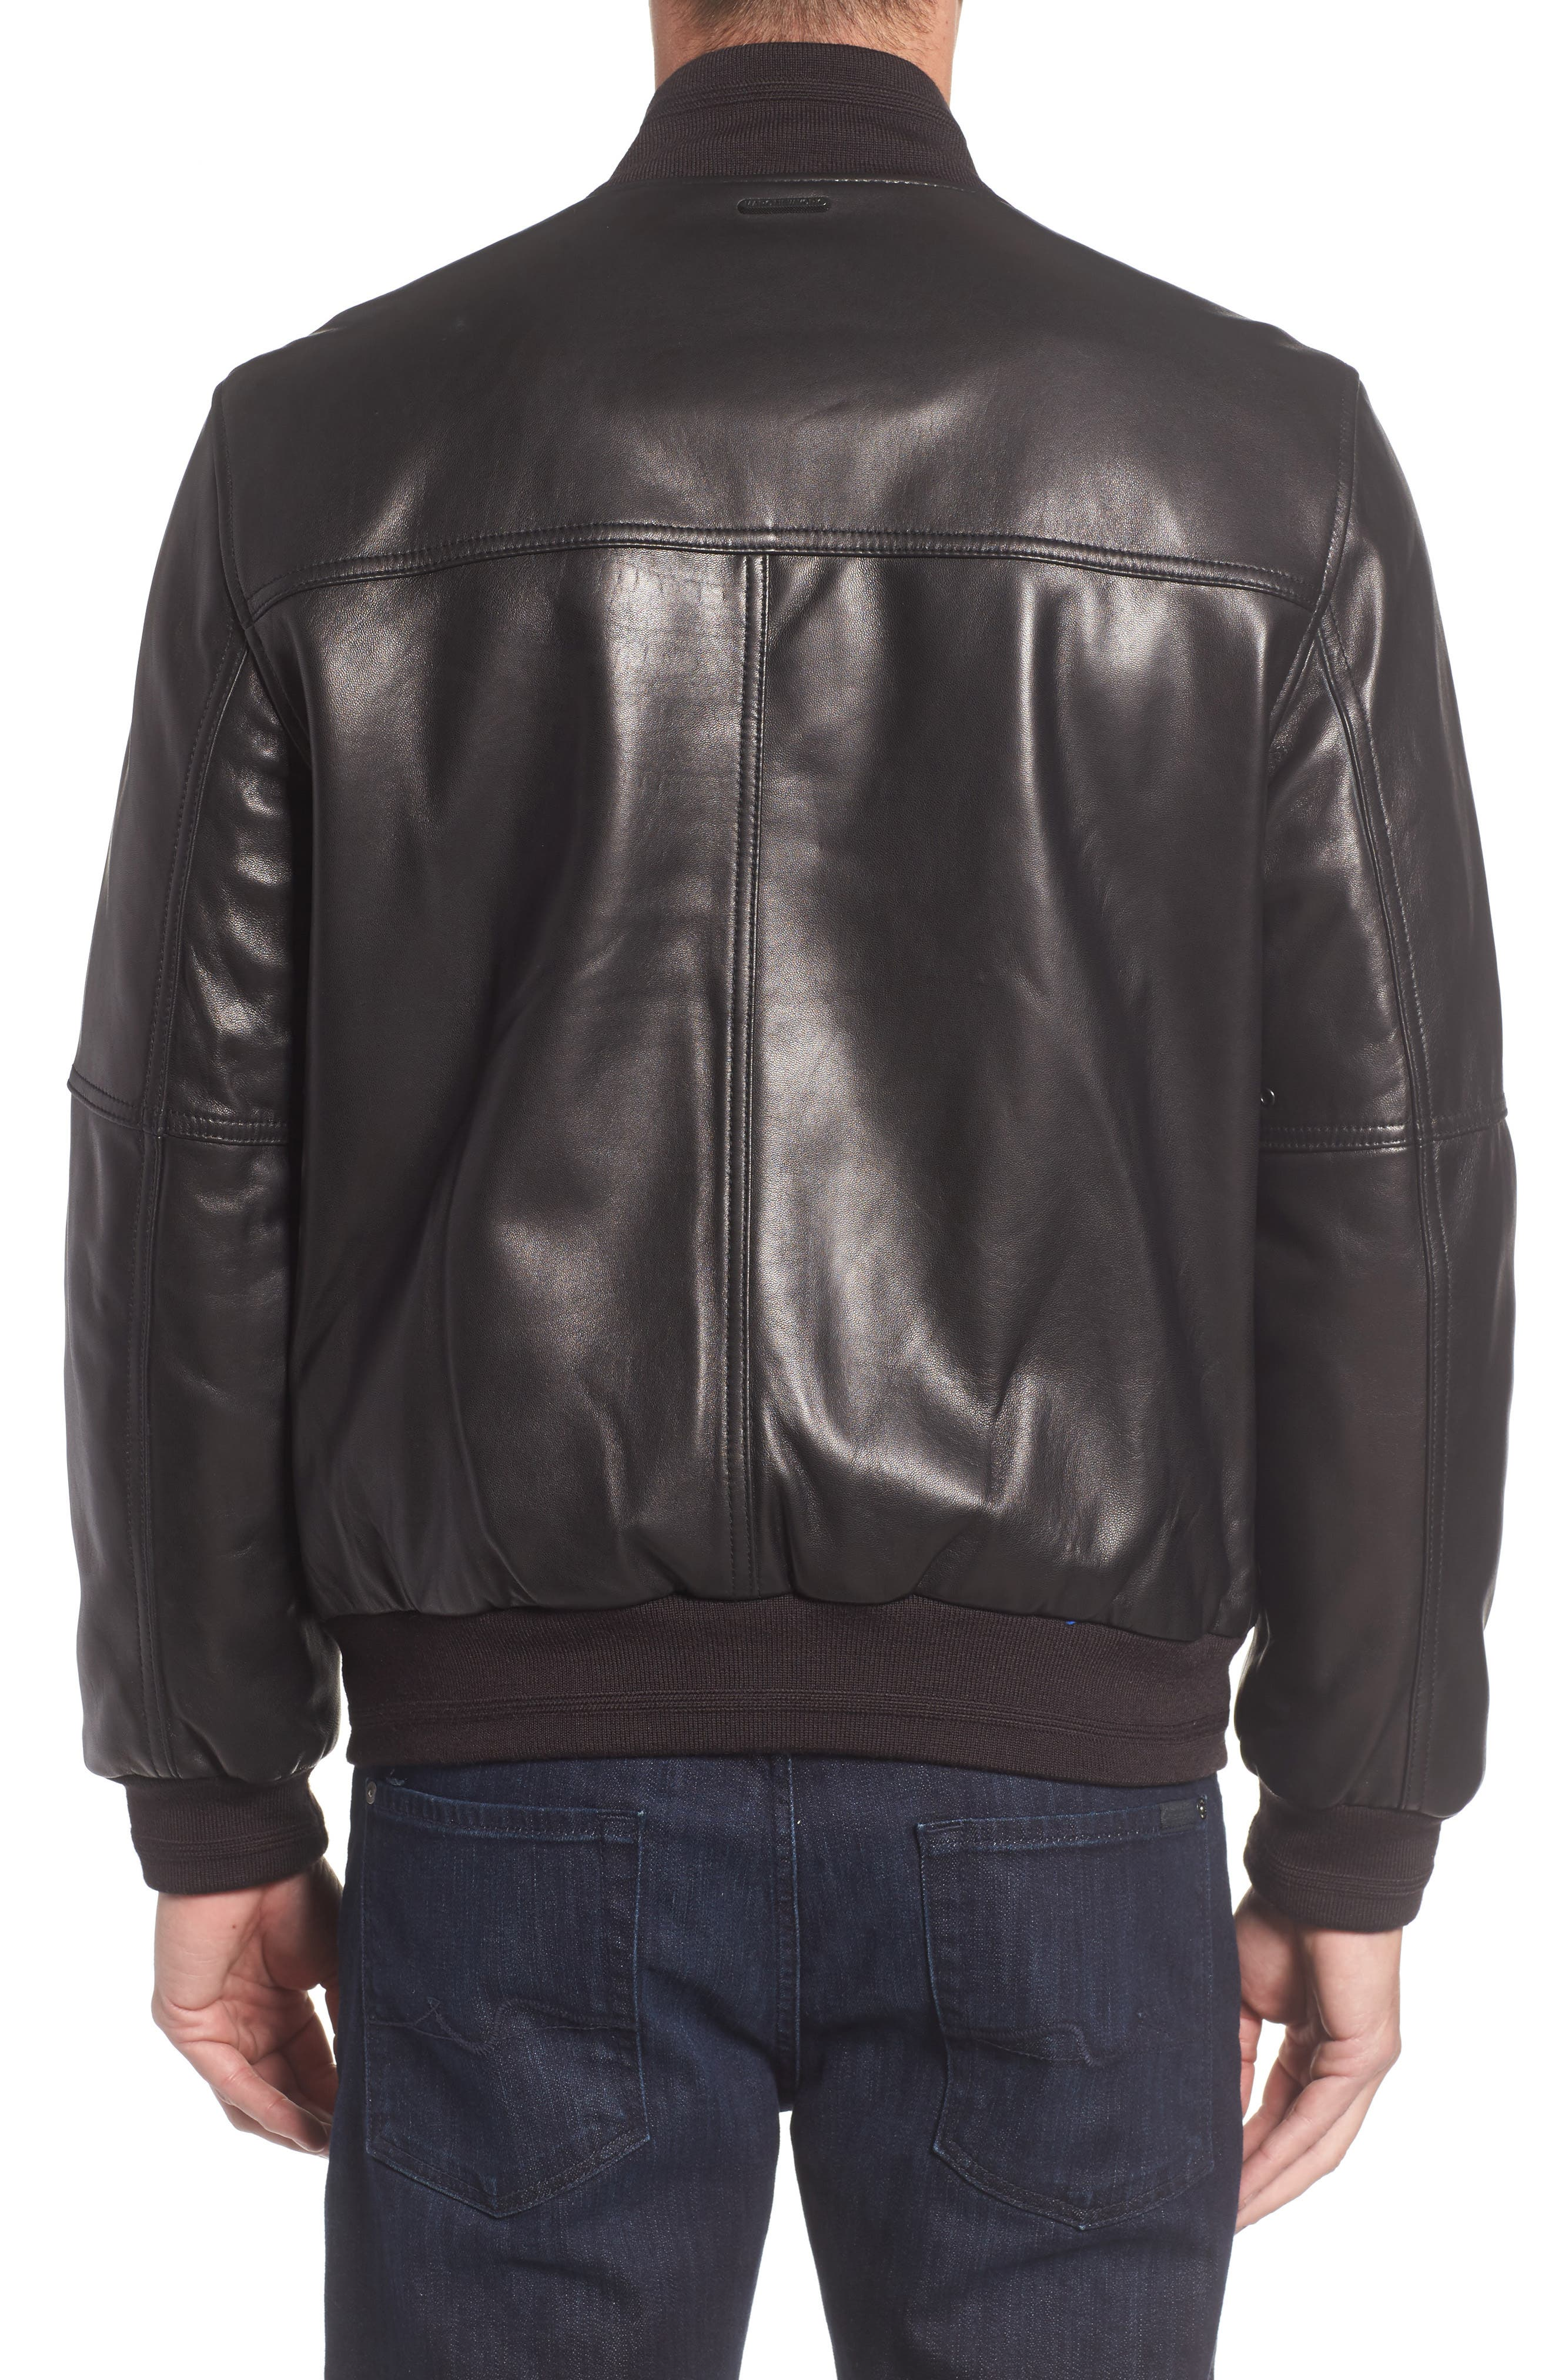 Summit Leather Bomber Jacket,                             Alternate thumbnail 2, color,                             Black